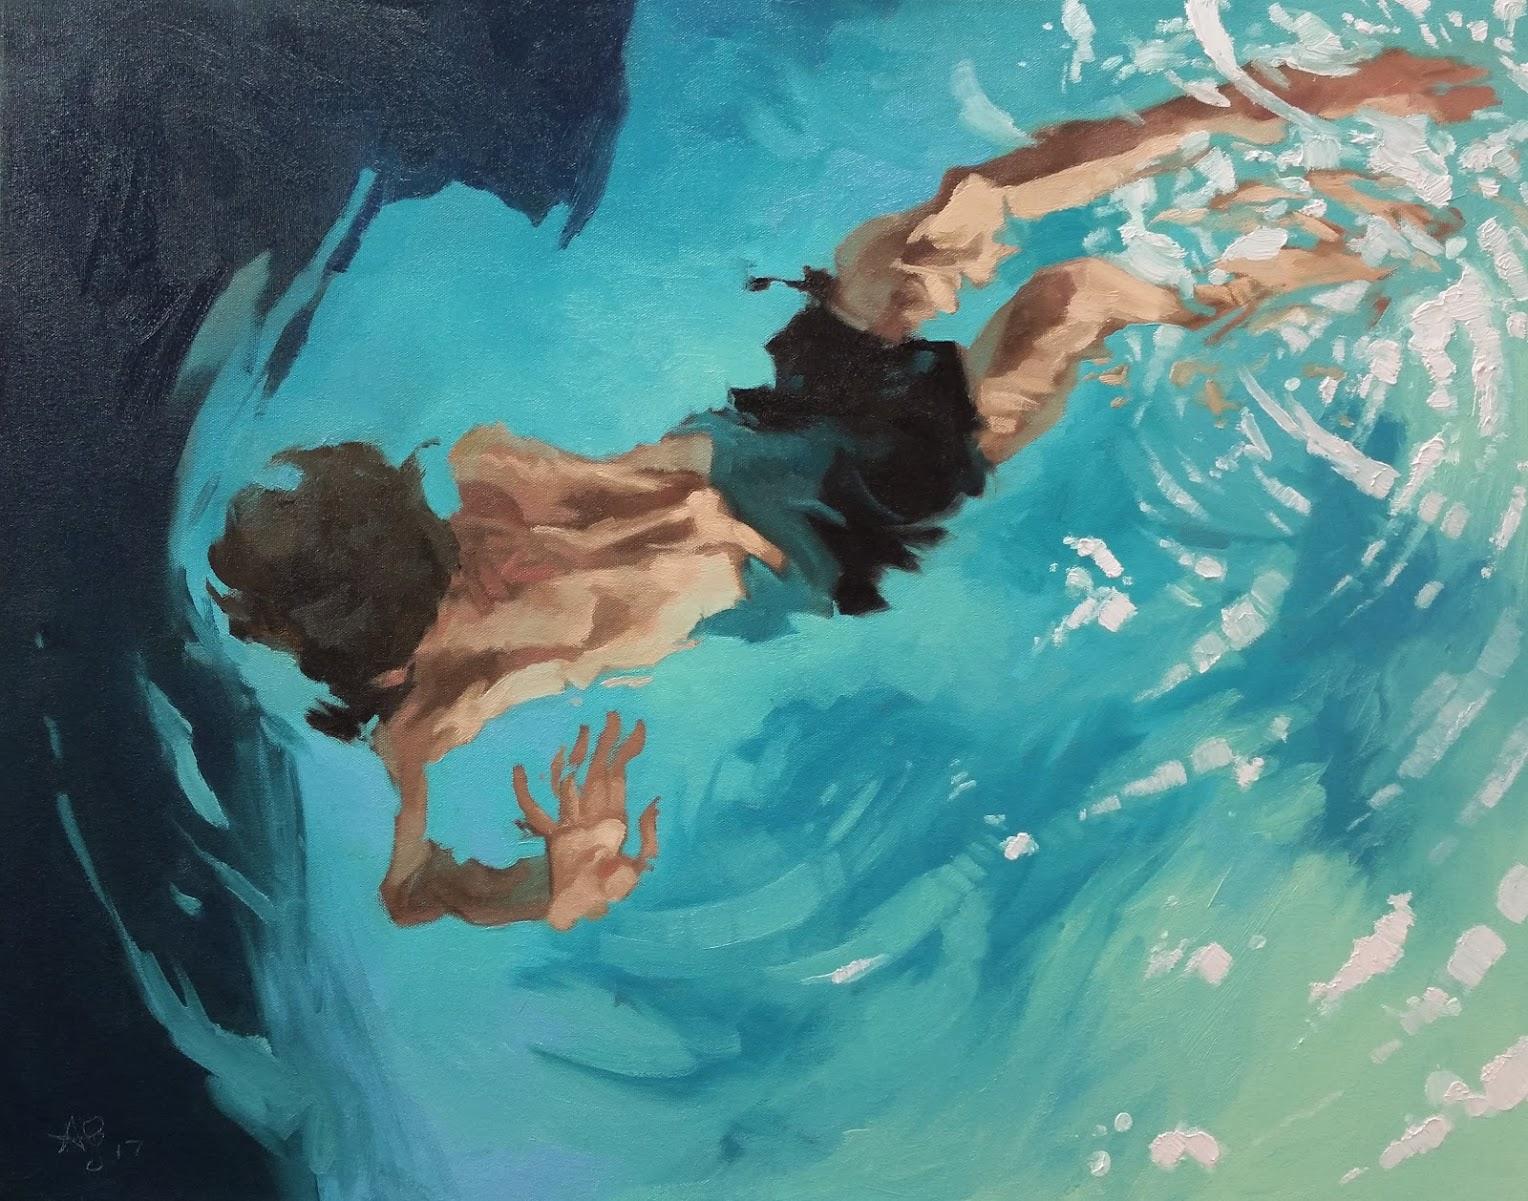 Swimmer (Oxygen), 2017